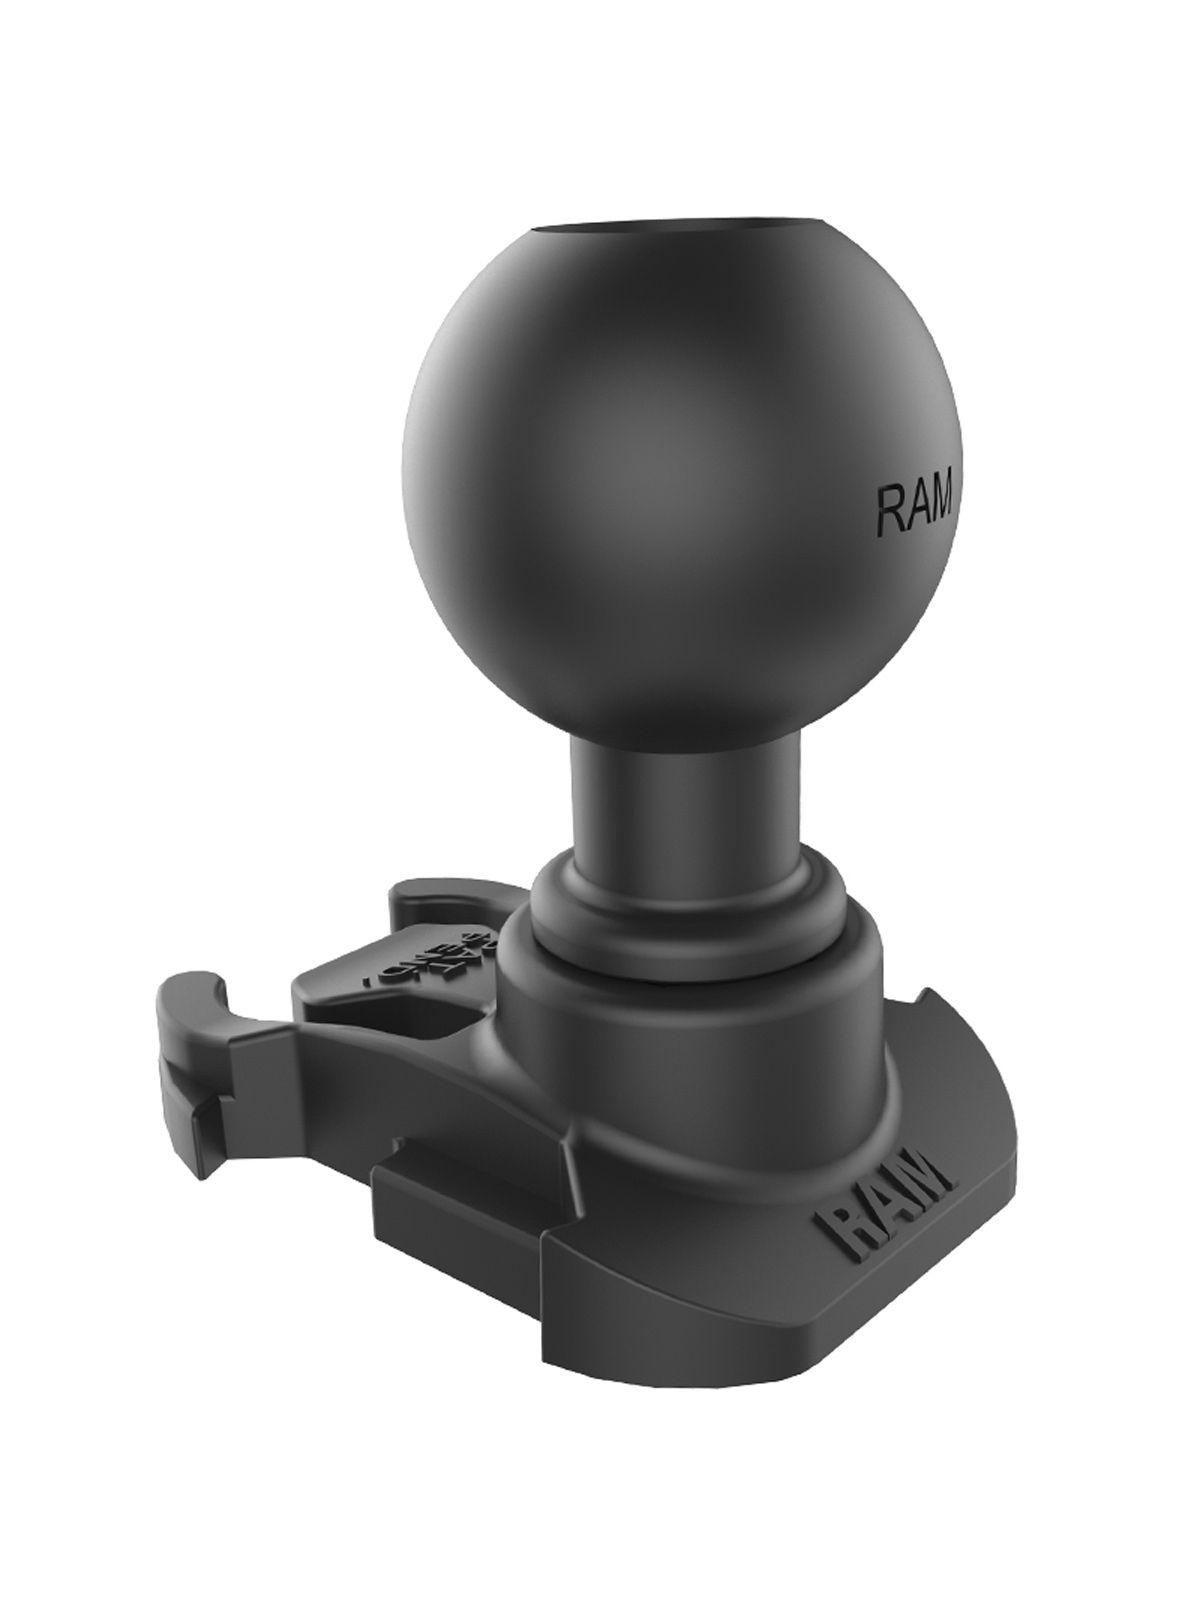 RAM Mounts GoPro Kamera-Adapter (für Original GoPro-Basis) - Verbundstoff, B-Kugel (1 Zoll), im Polybeutel